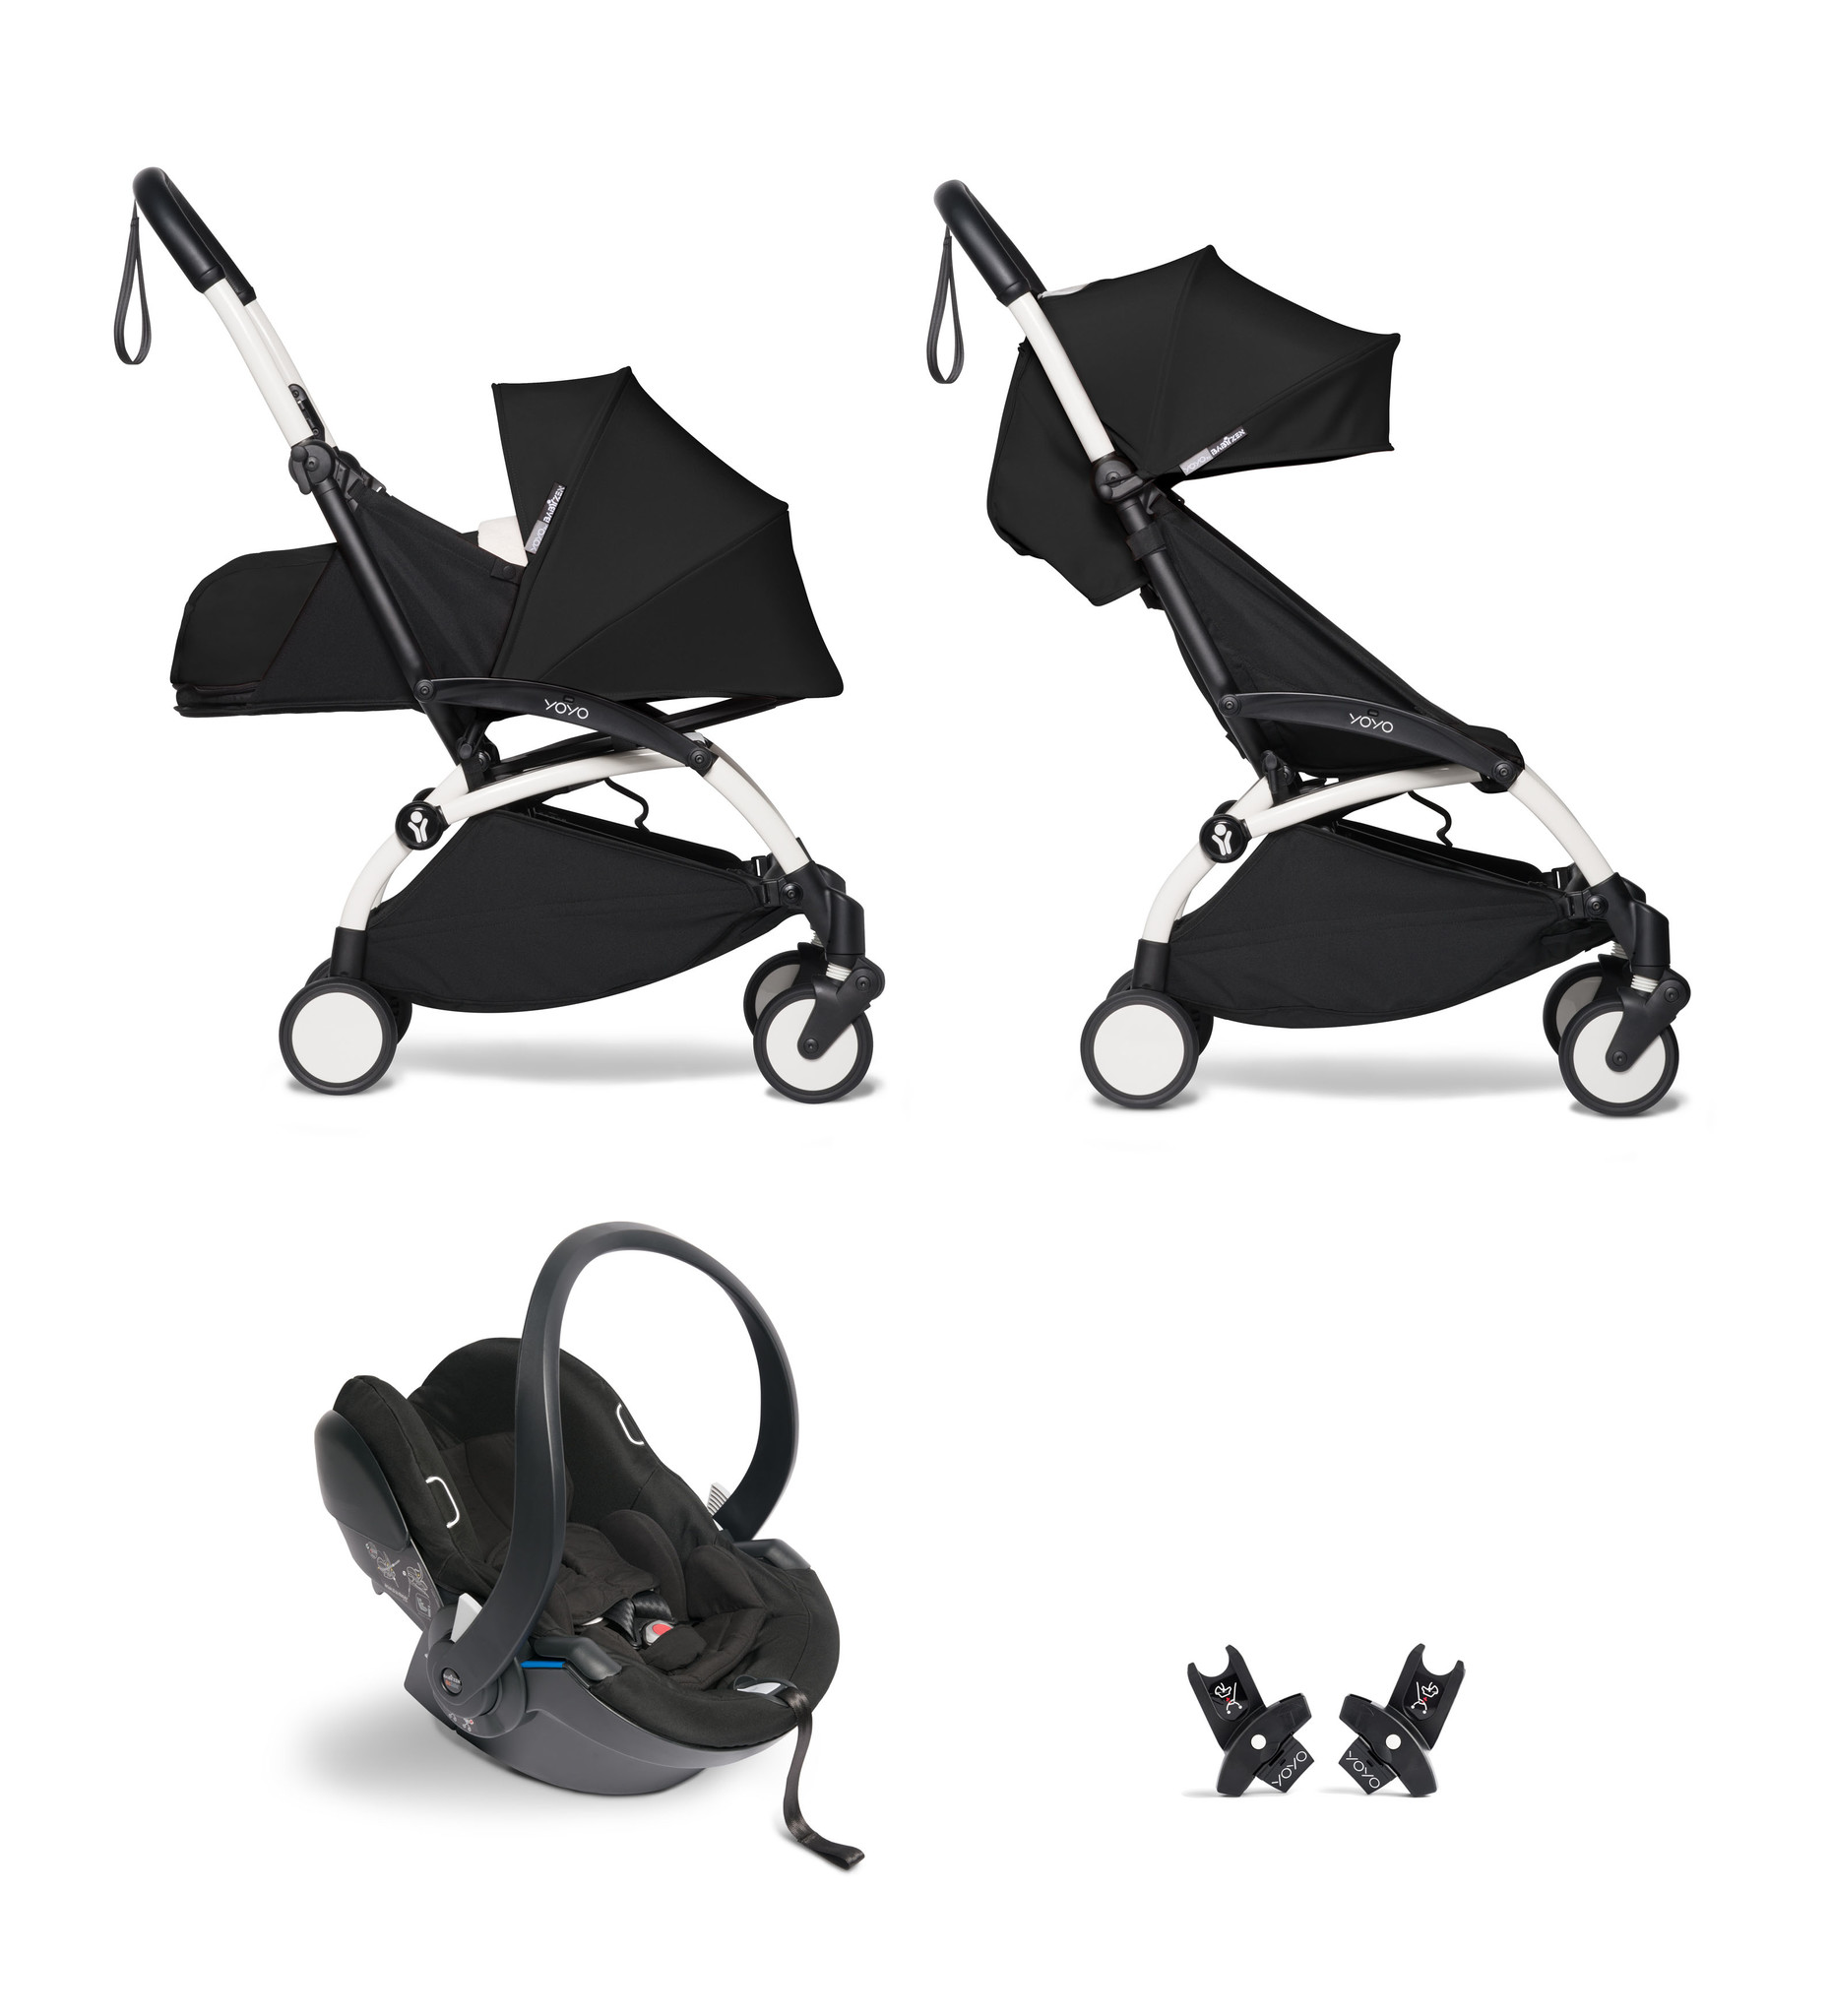 Babyzen YOYO² buggy COMPLEET / FULL SET 0+ and 6+ zwart frame wit incl. YOYO² BeSafe autostoel zwart